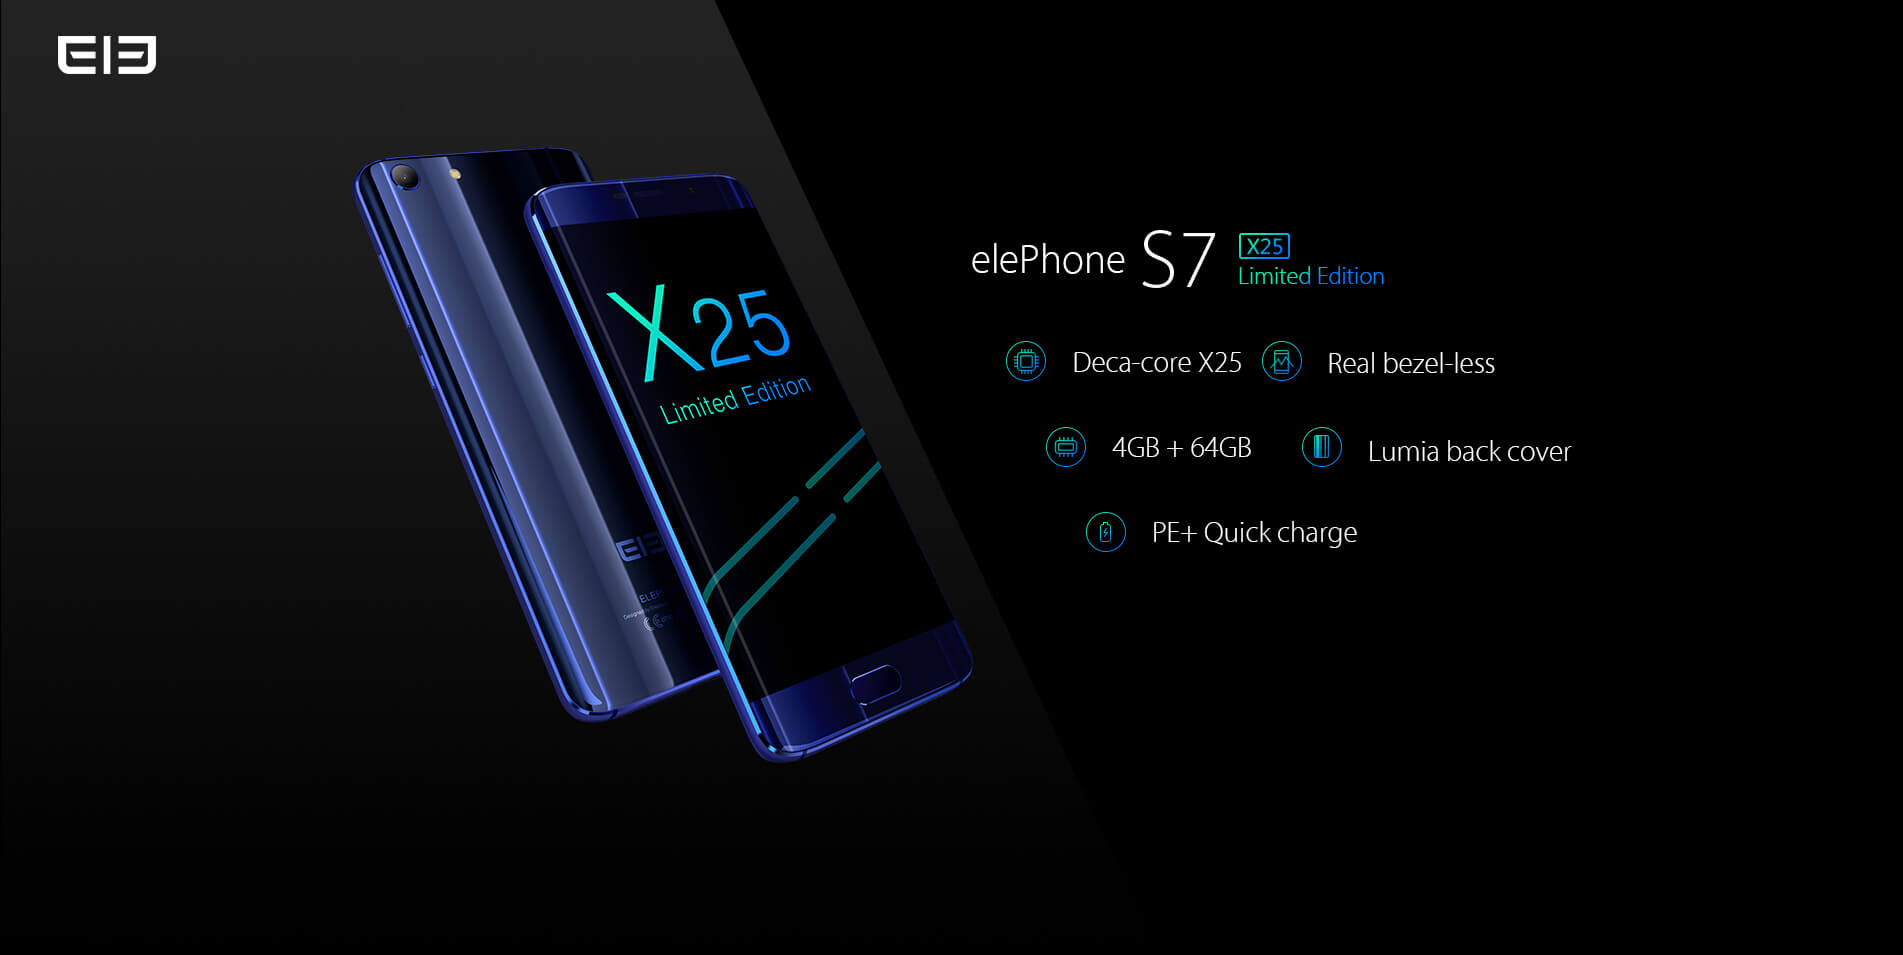 Elephone S7 Treasure edition